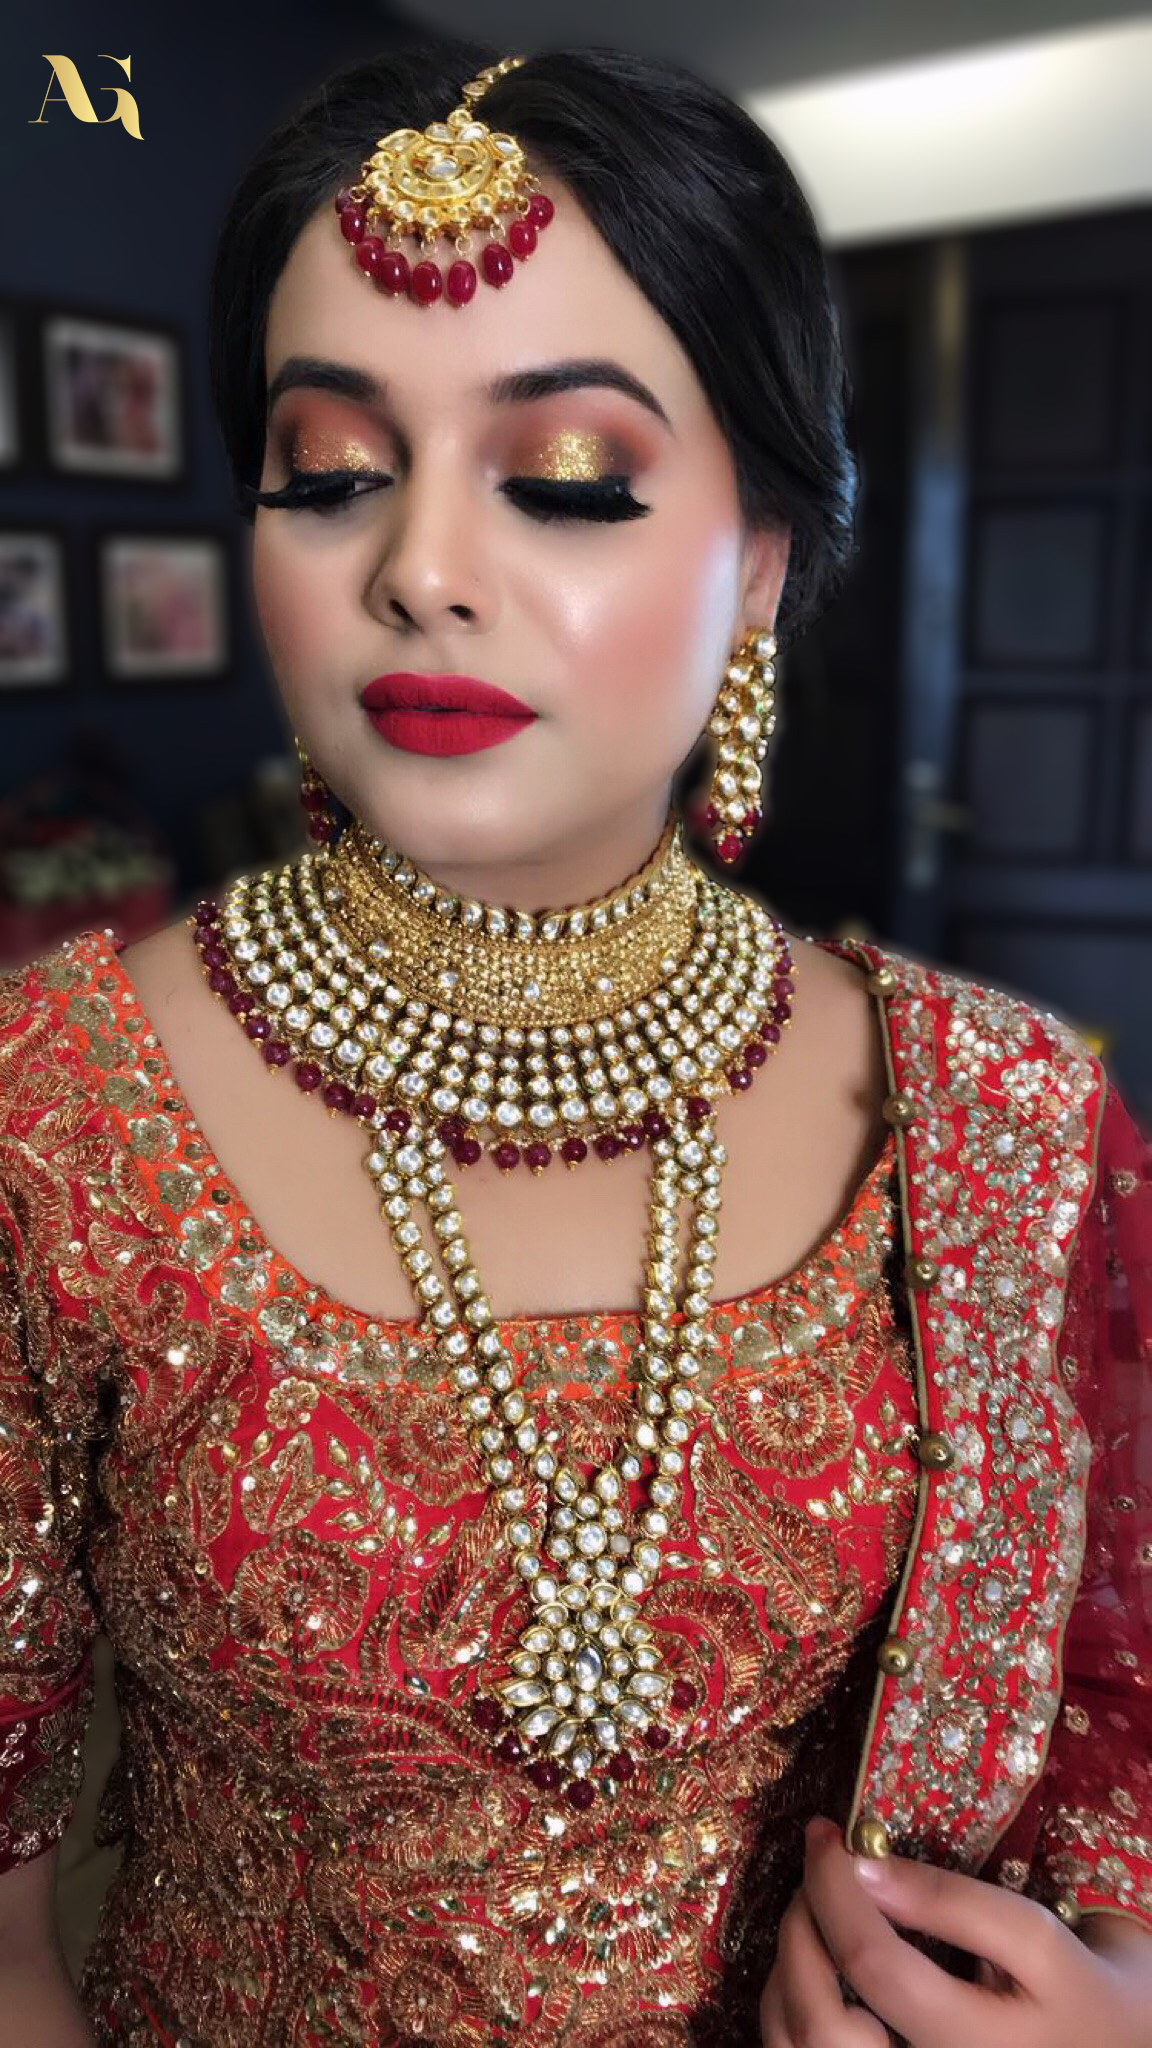 Traditional bridal makeup... Still so fresh and charming